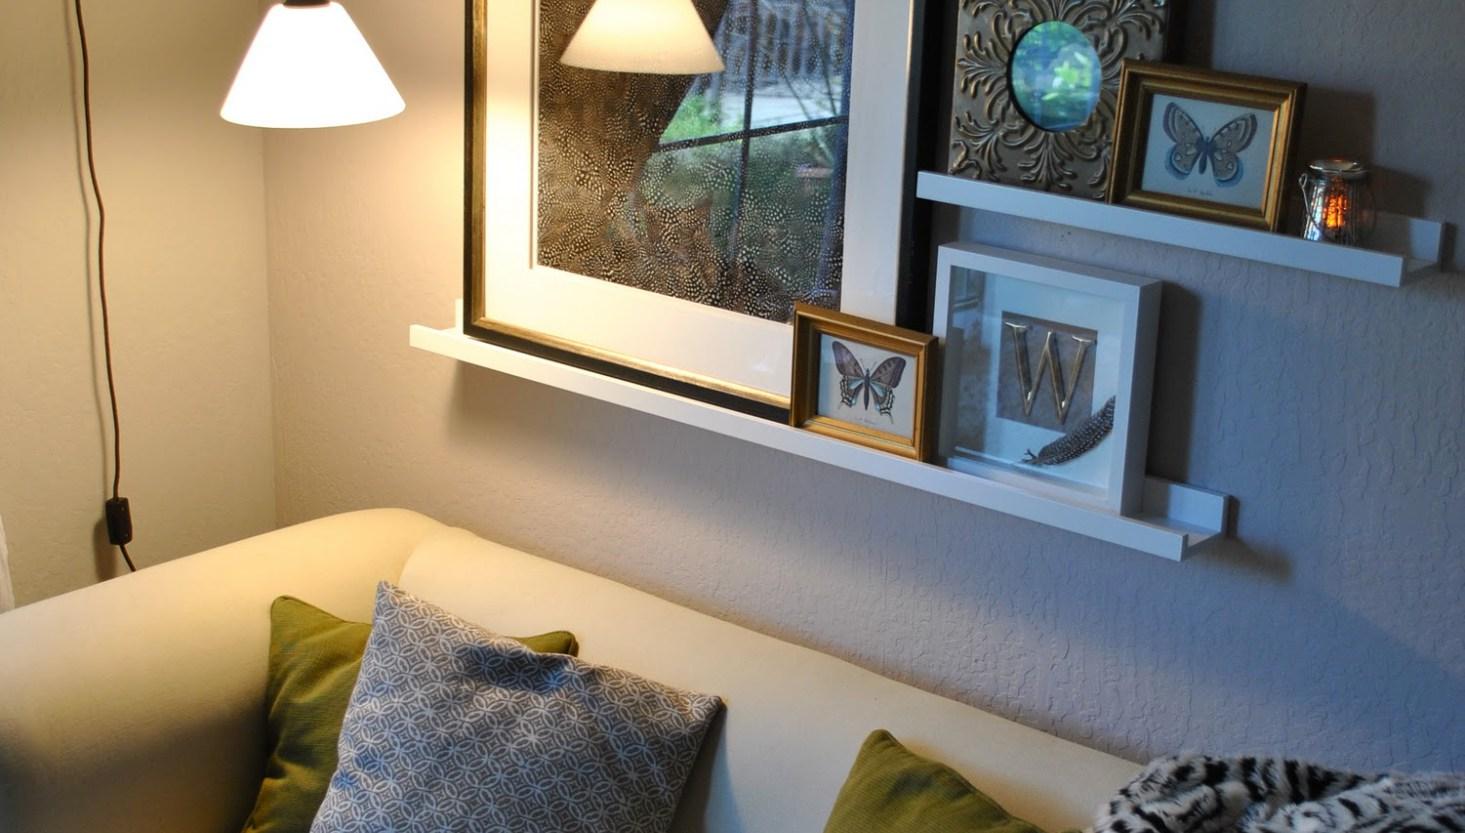 Enthralling Wall Shelf Ideas For Living Room Of Livingroom Dvd Shelves Target Accessories Mounted